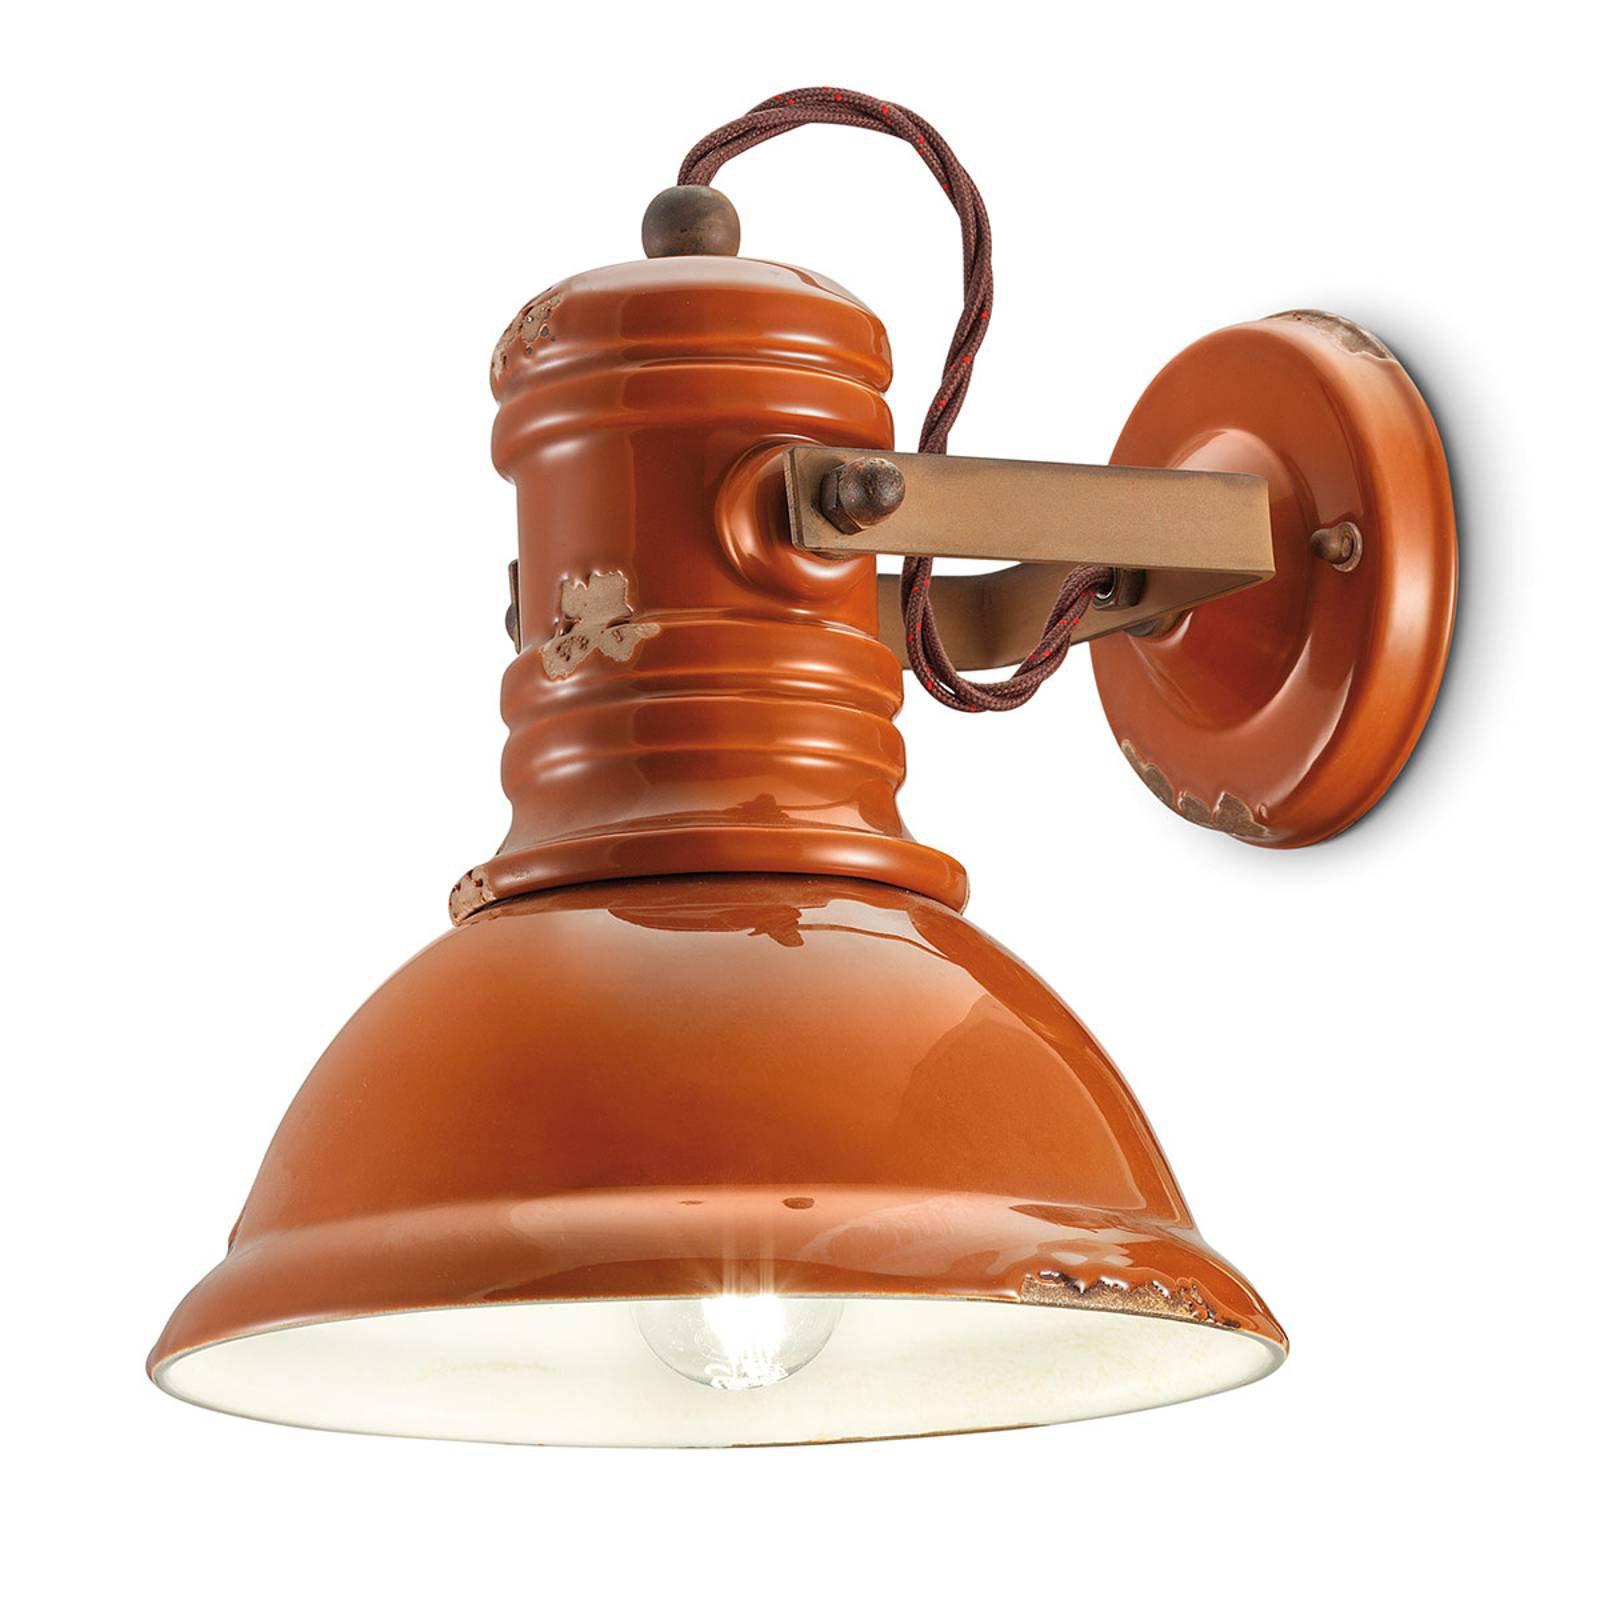 Vegglampe keramikk C1693 industriell stil oransje